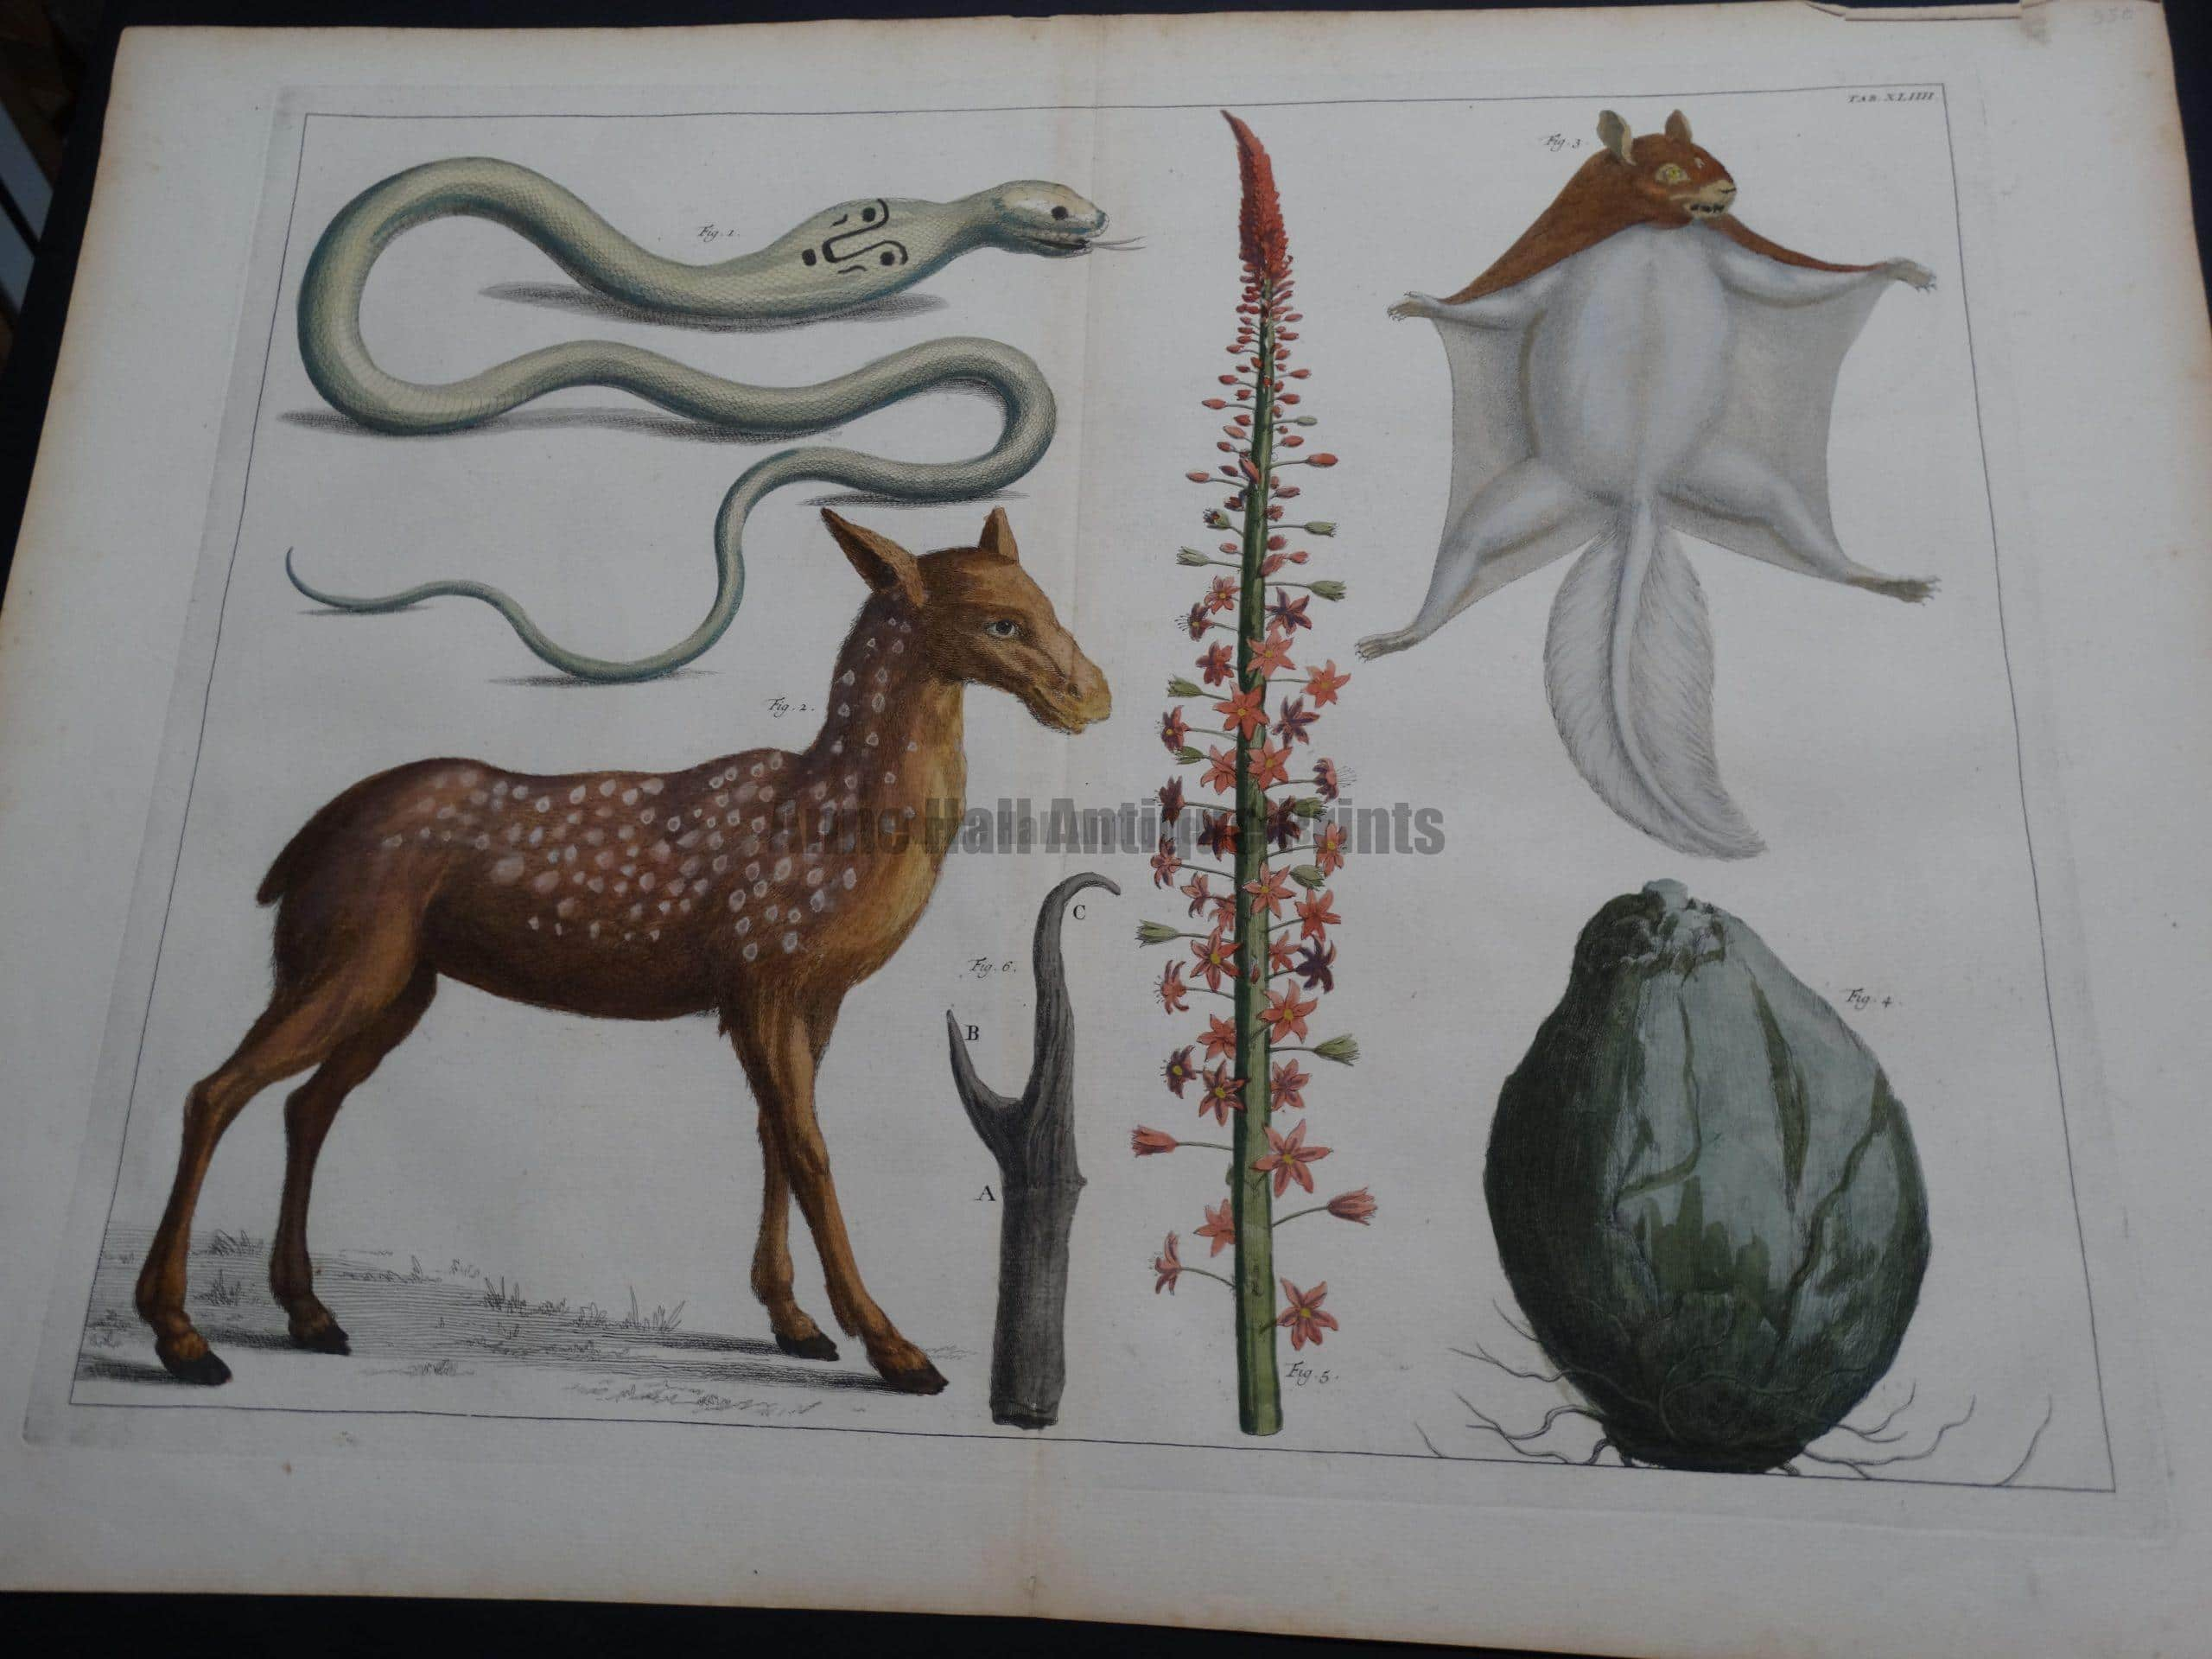 Albertus Seba Strange Critters Pl. XLIIII